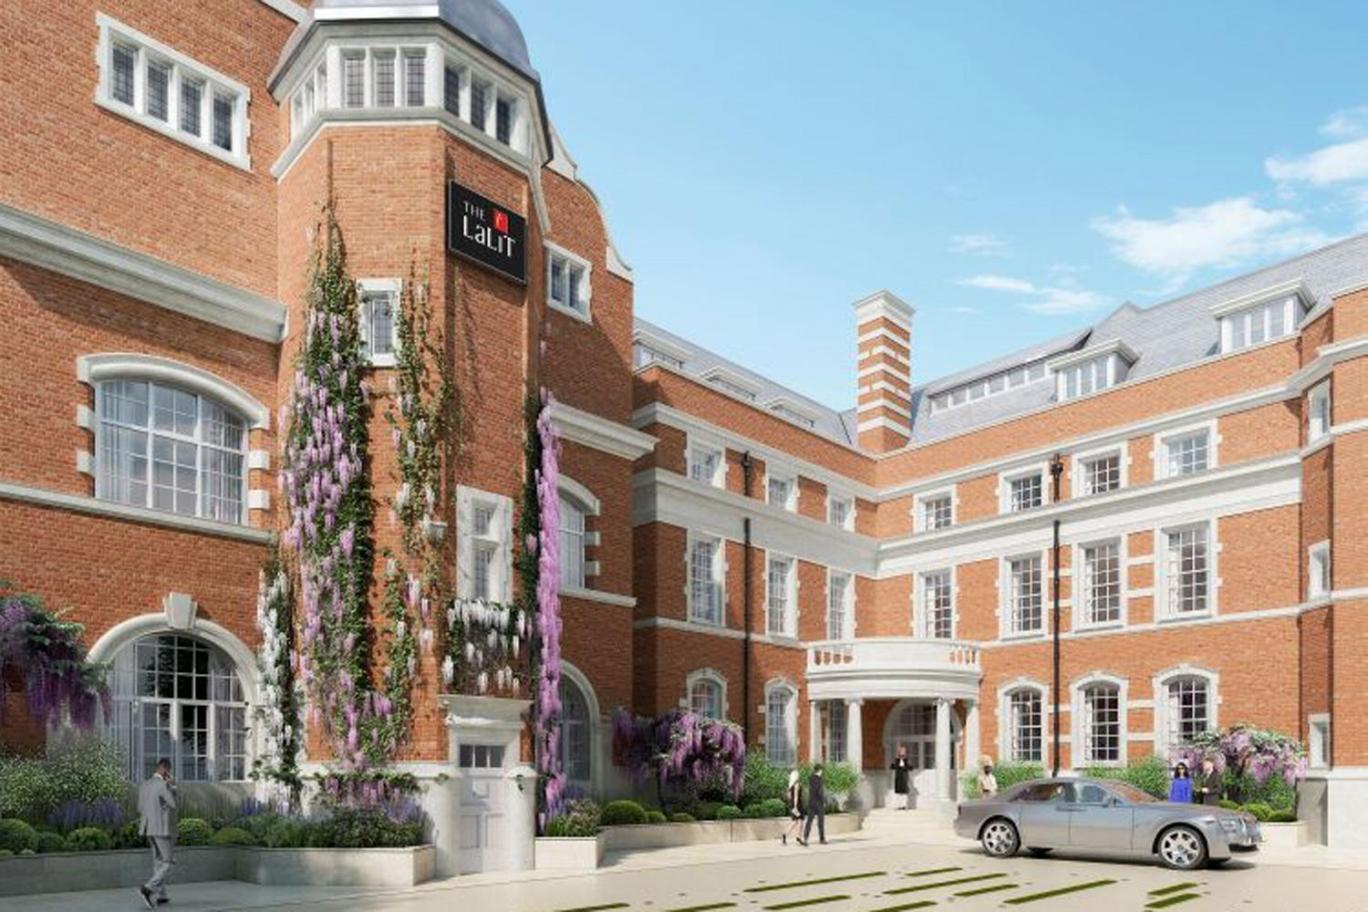 london-hotel